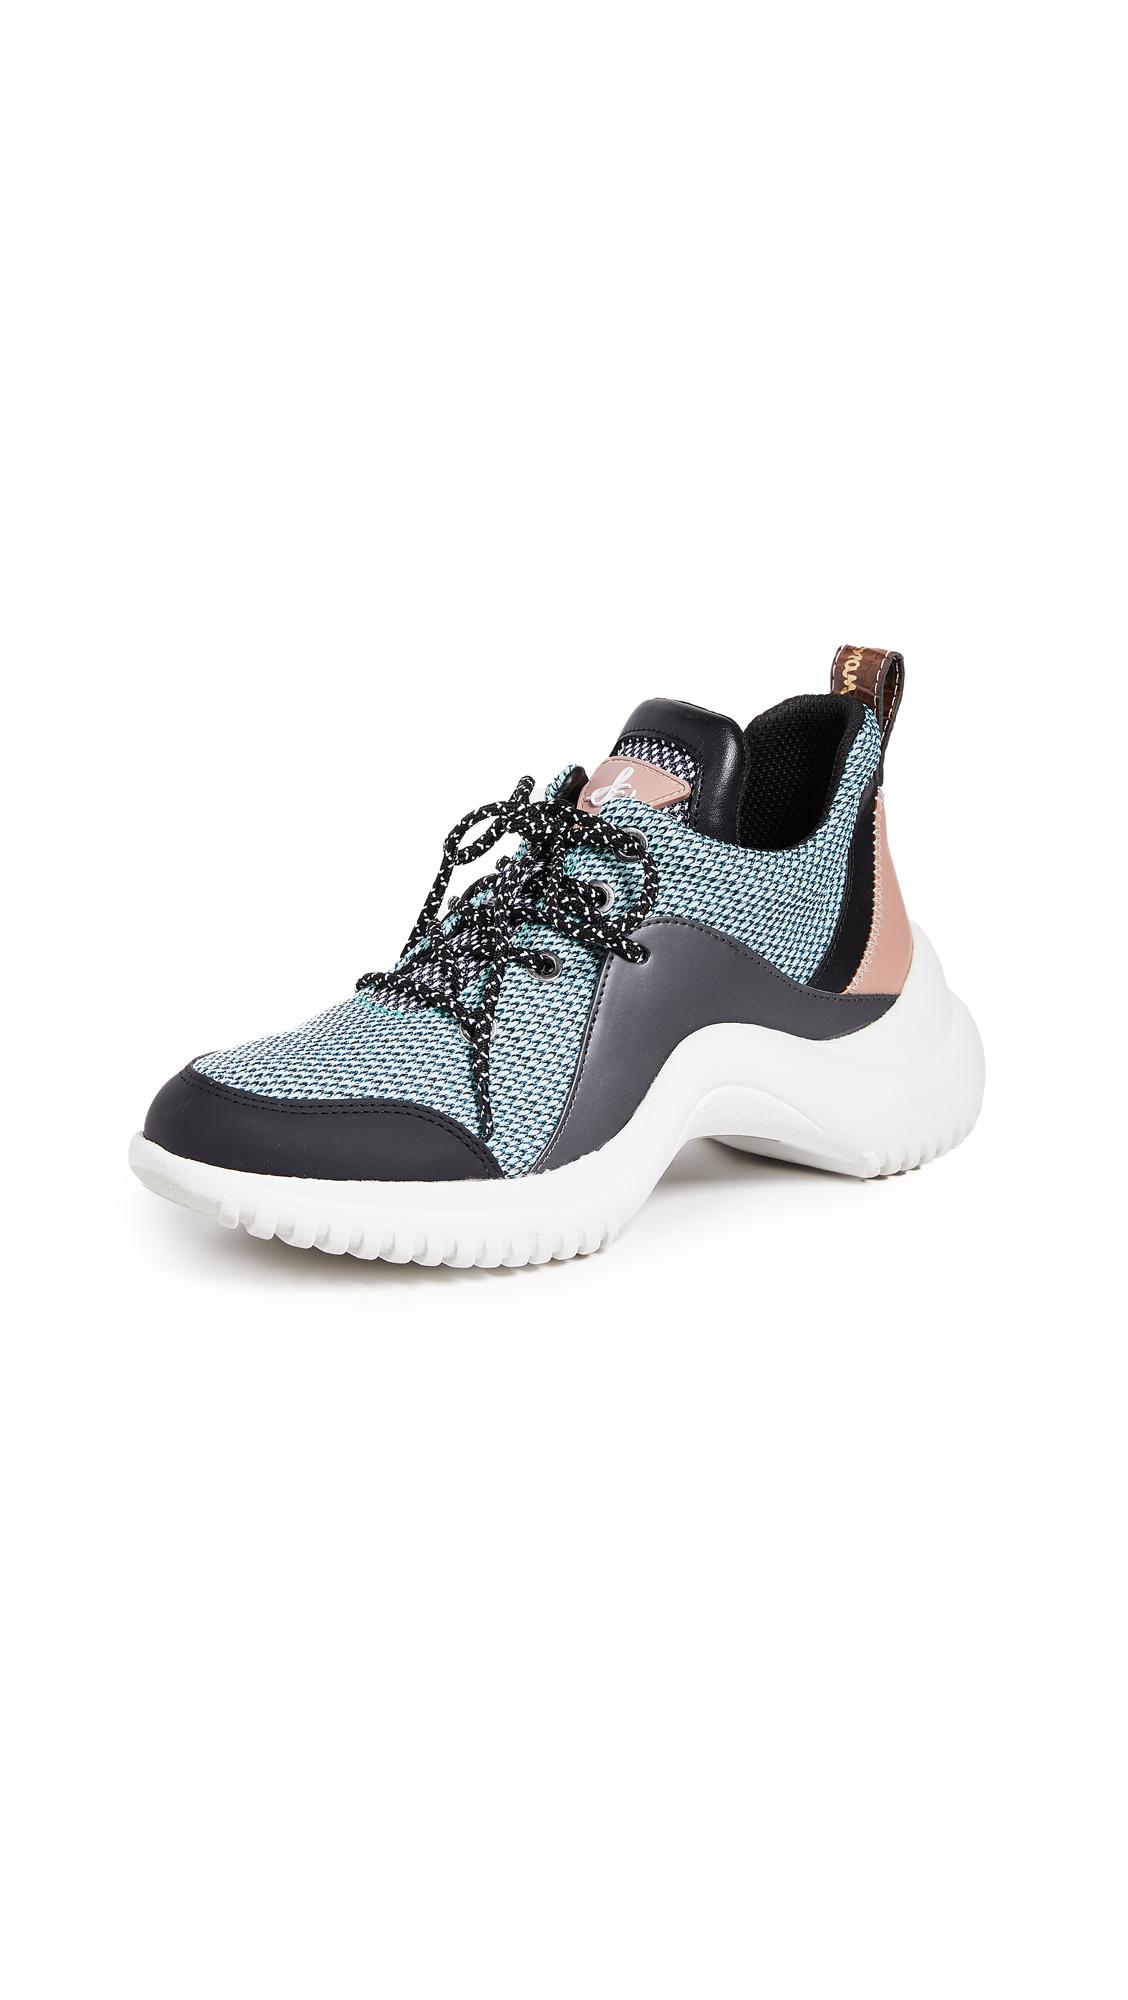 Sam Edelman Meena Sneakers - Mint Multi